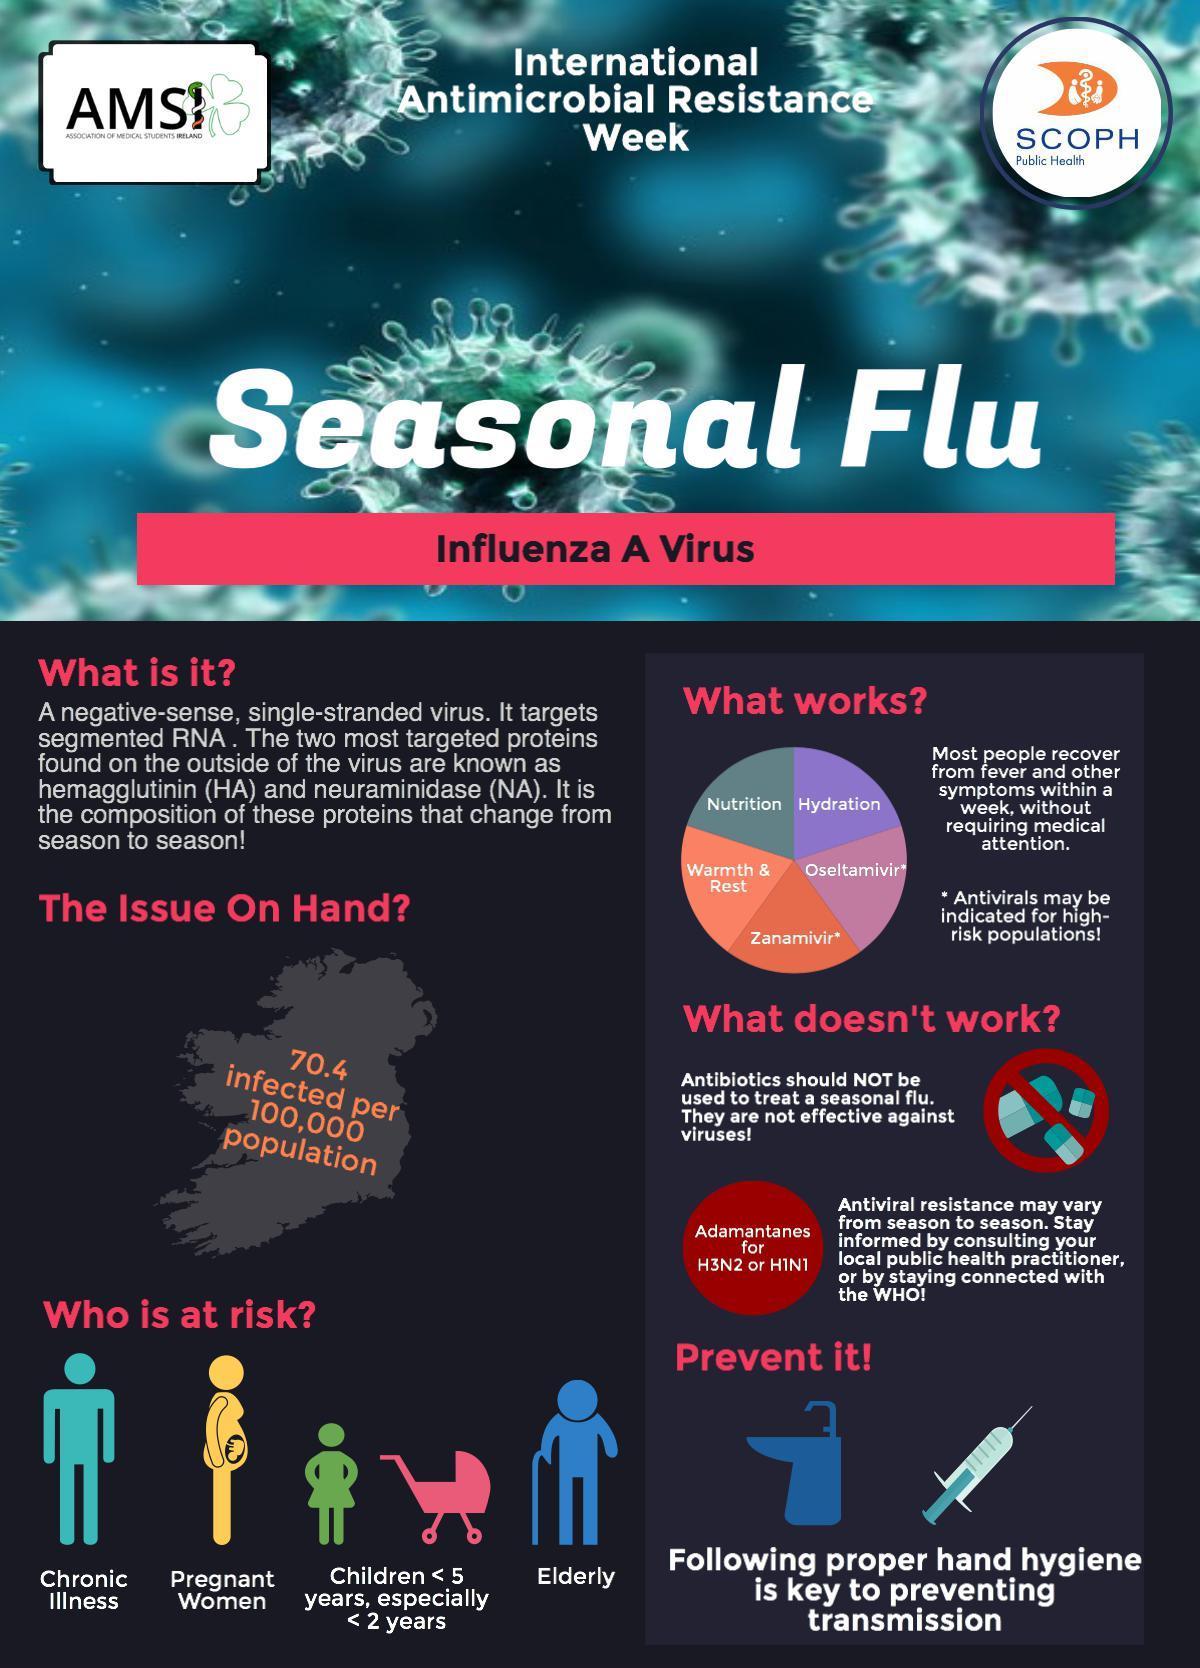 AMR Week Influenza A.jpeg